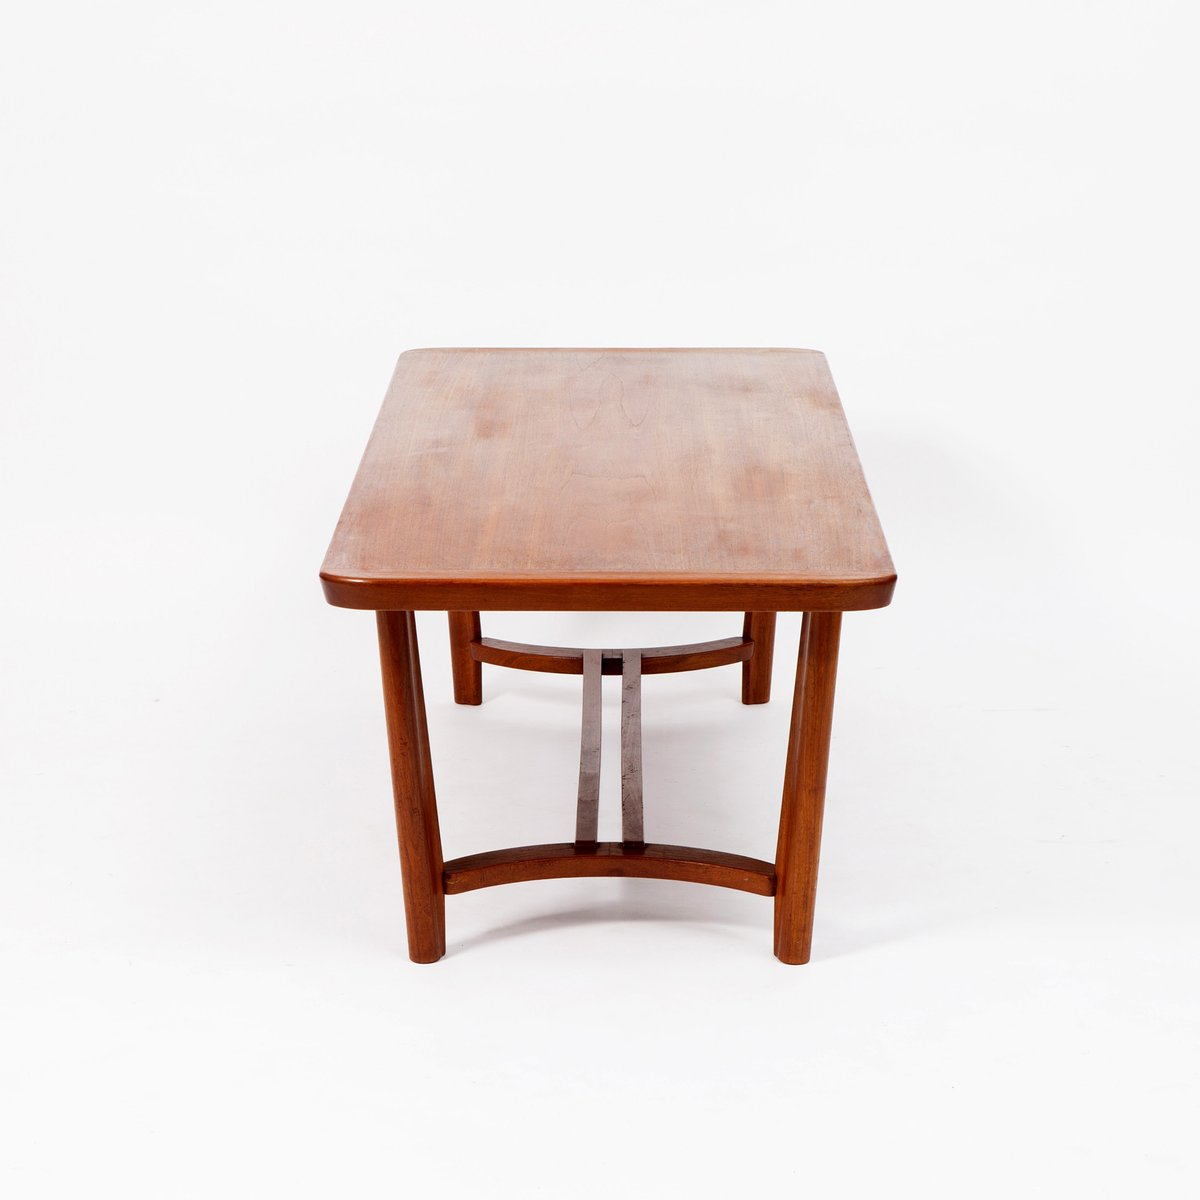 table basse mid century scandinave en teck en vente sur pamono. Black Bedroom Furniture Sets. Home Design Ideas